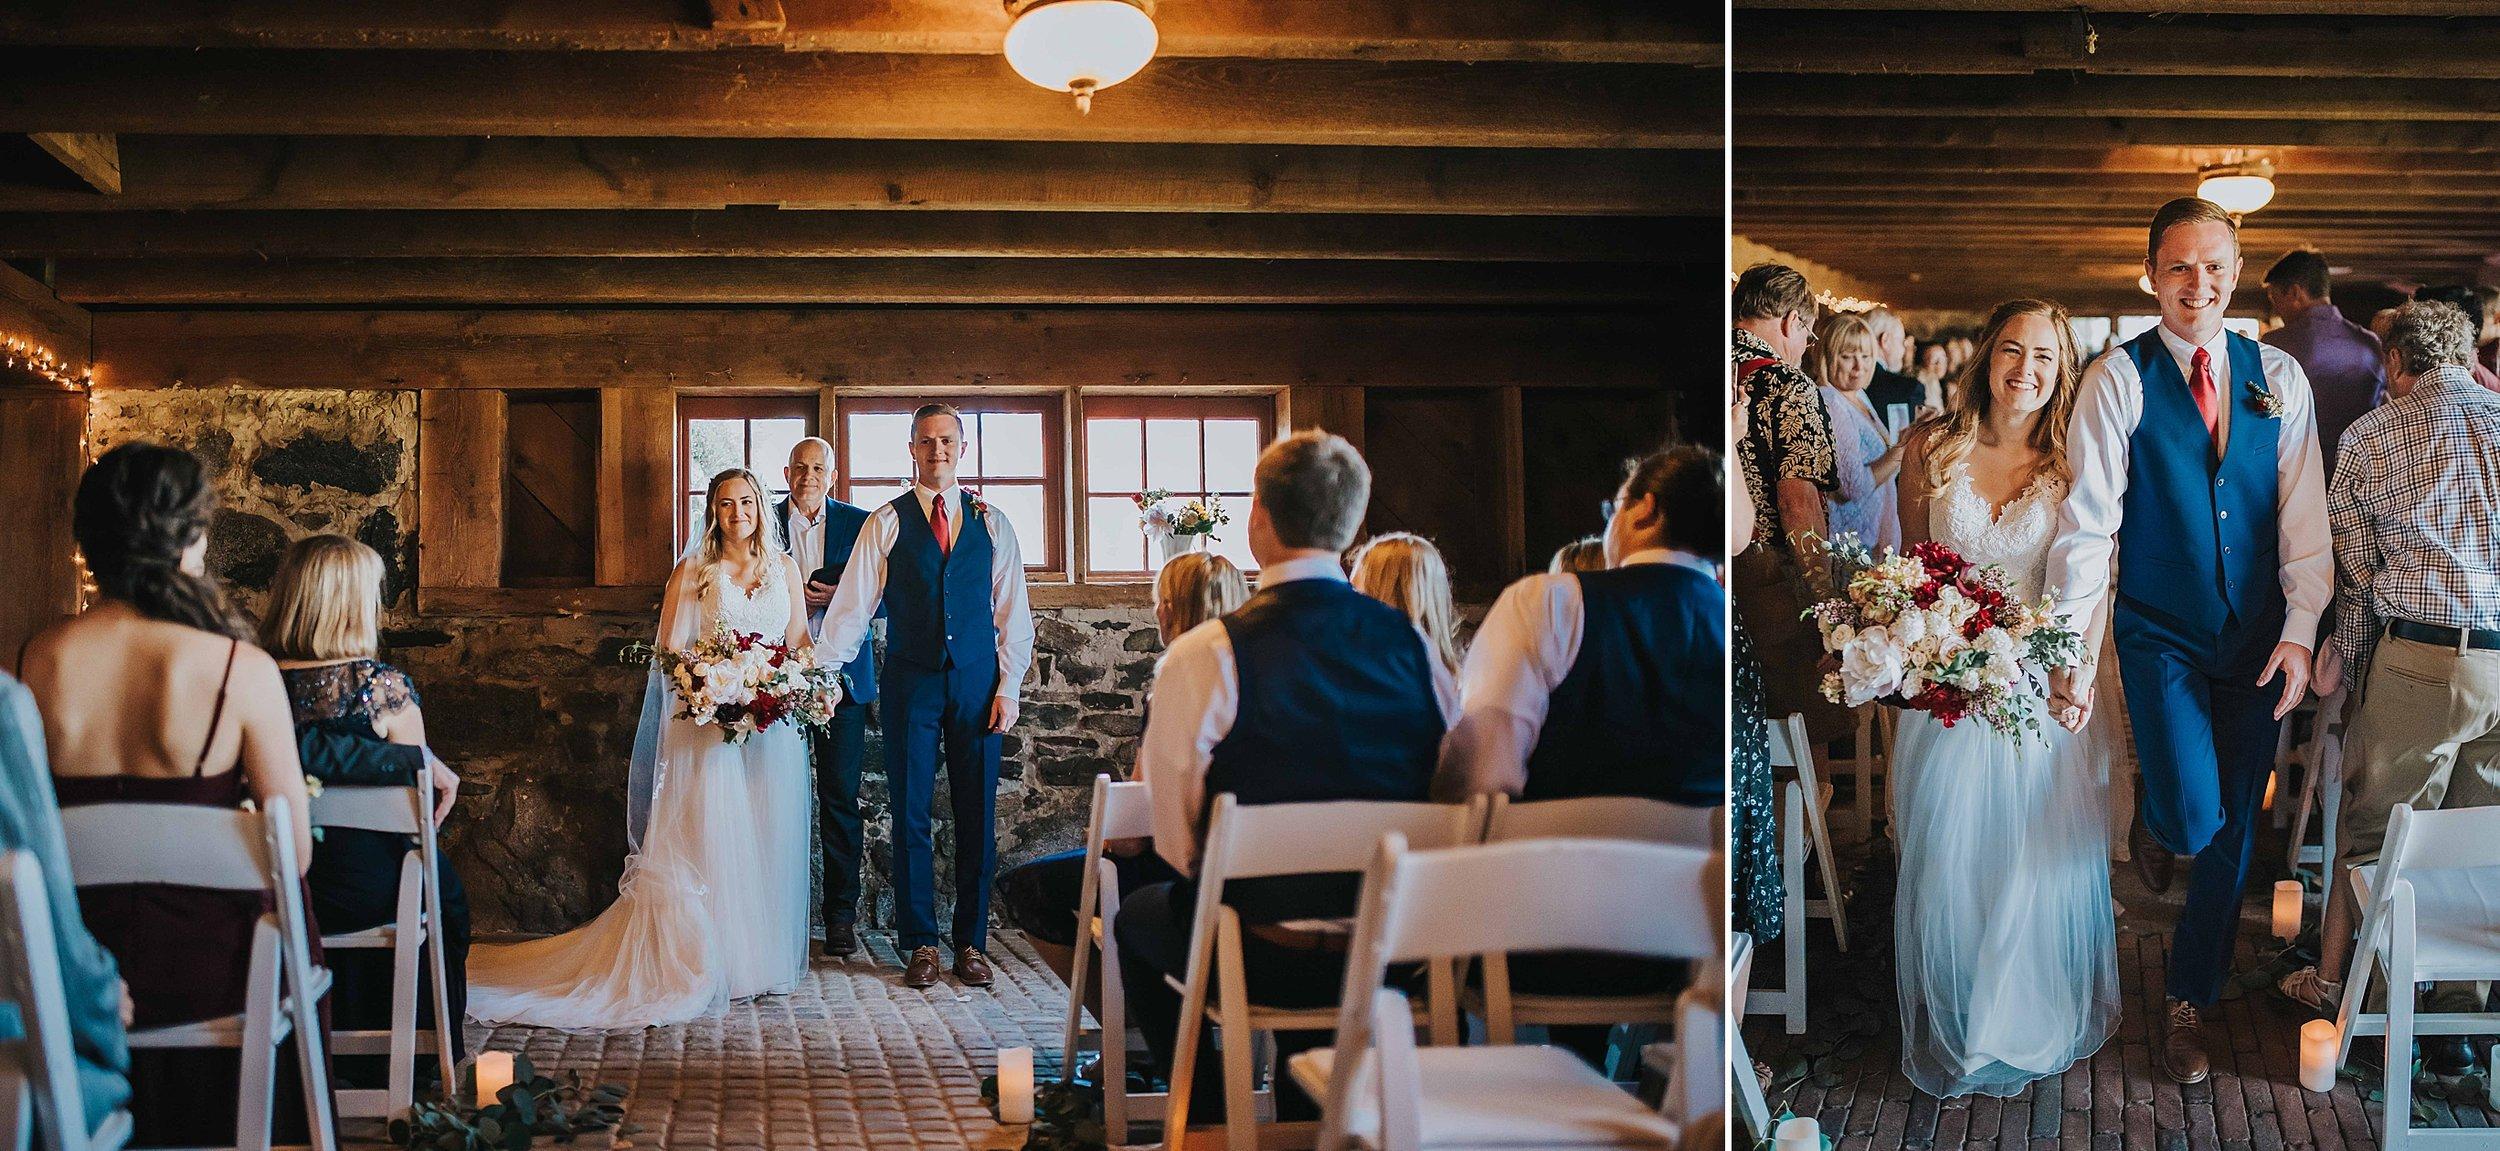 Crockett Farm-Wedding-photographer-J HODGES PHOTOGRAPHY_0296.jpg